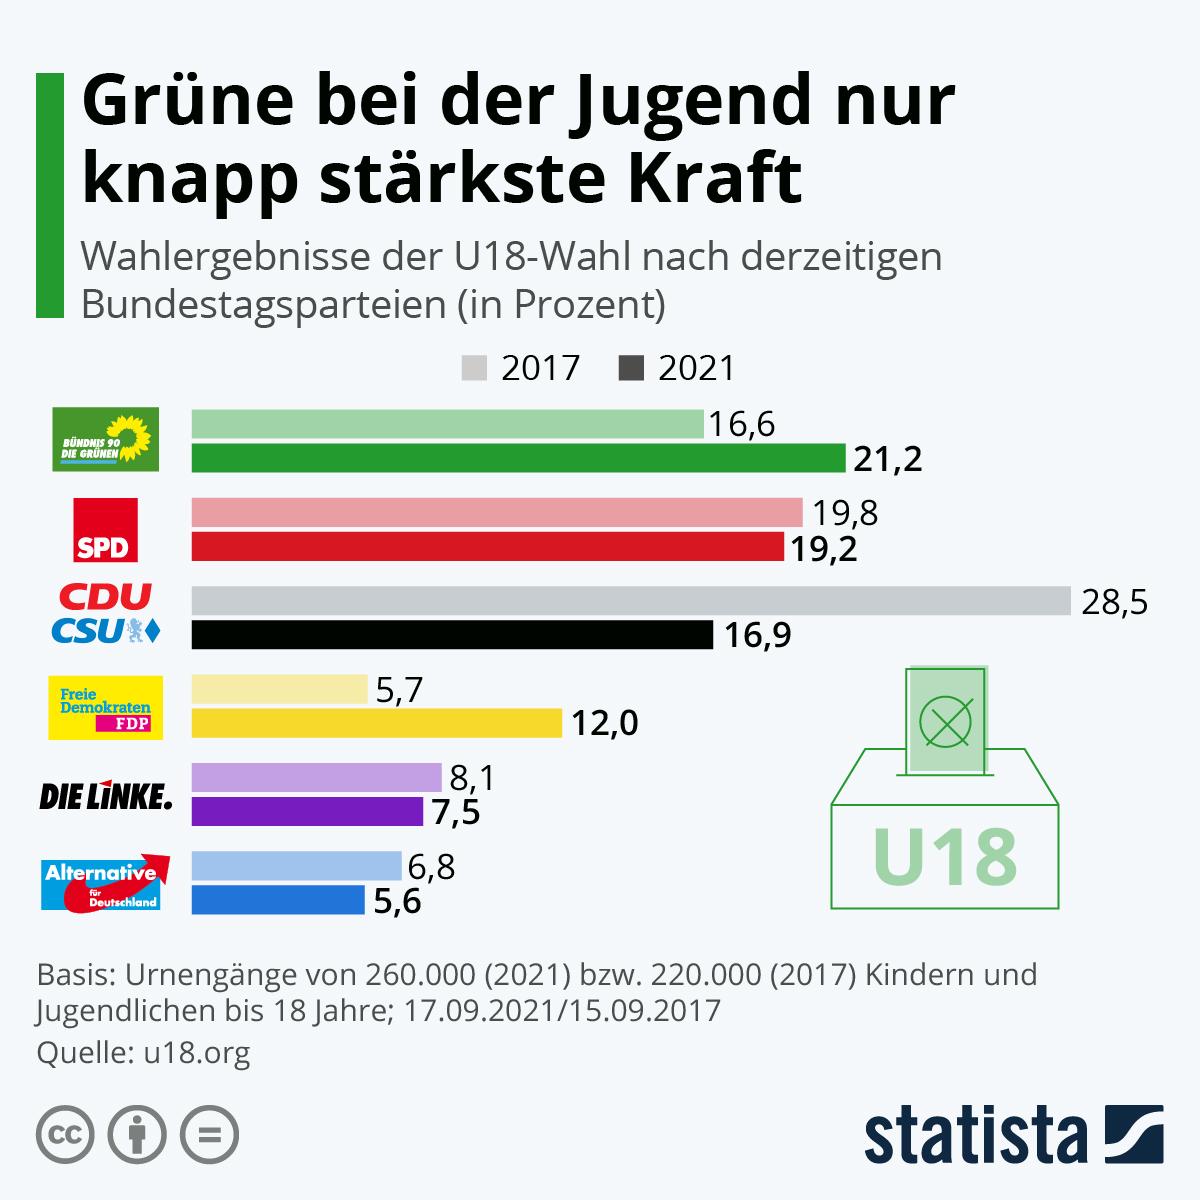 Infografik: Grüne bei der Jugend nur knapp stärkste Kraft   Statista